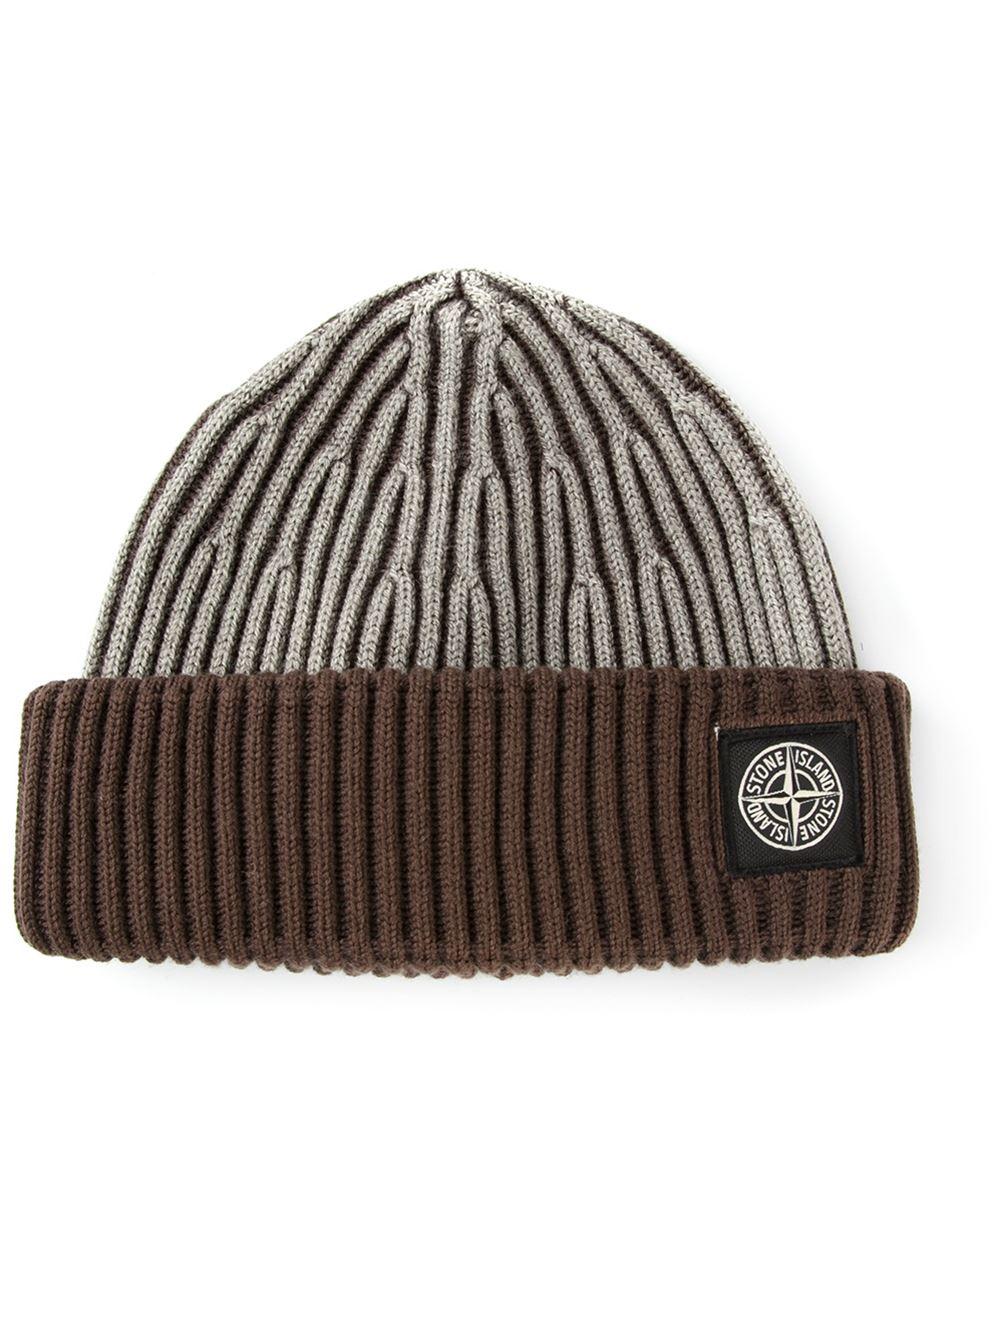 chunky knit beanie - White Stone Island f0m5ptFG